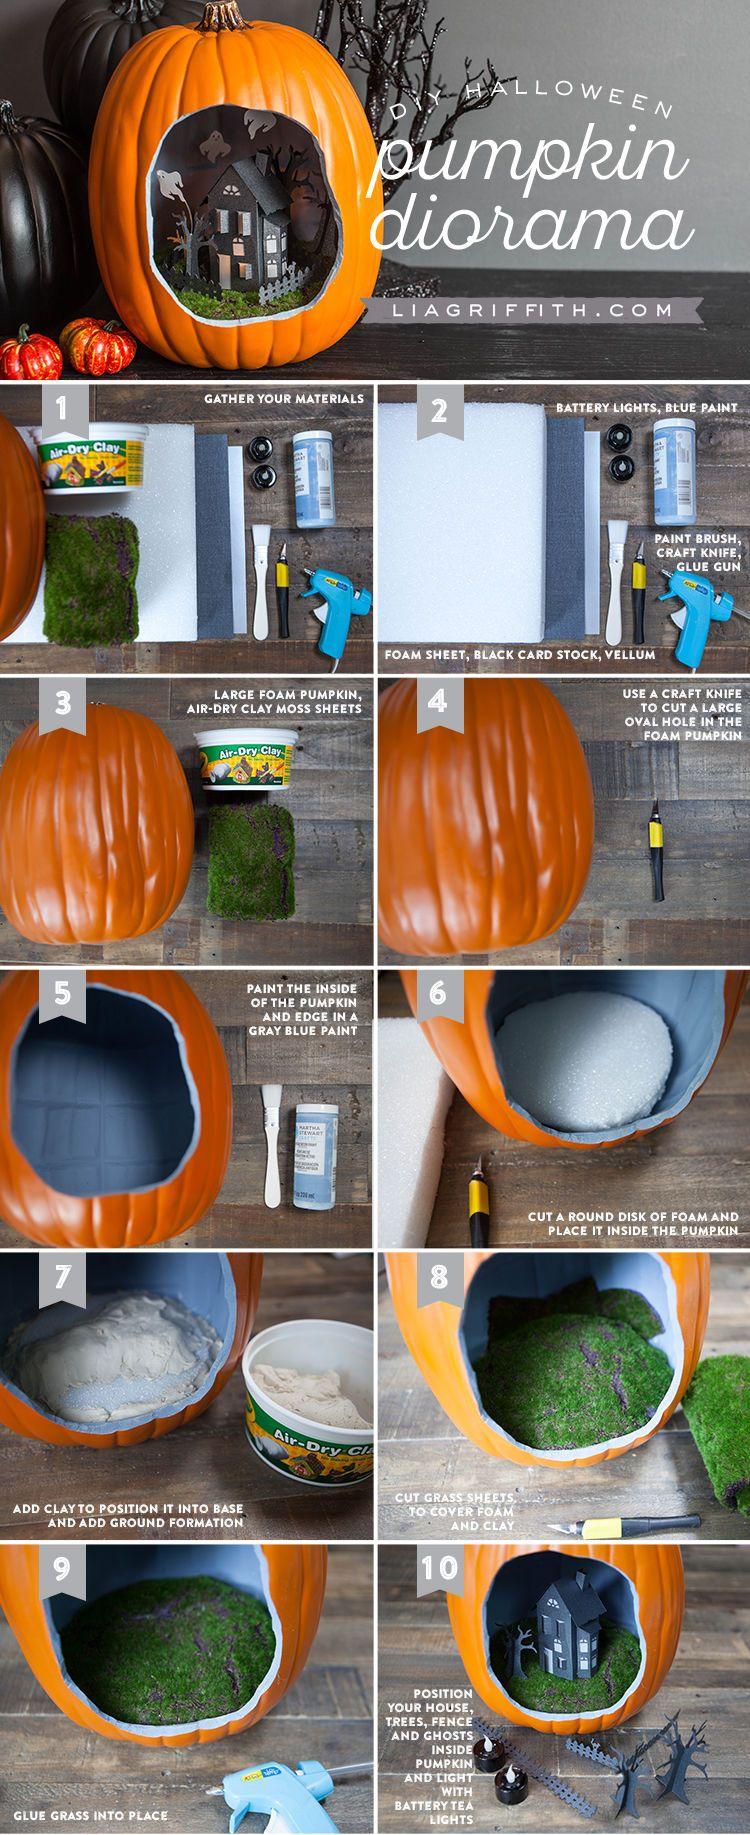 DIY Halloween Pumpkin Diorama diy craft halloween crafts how to - cute homemade halloween decorations